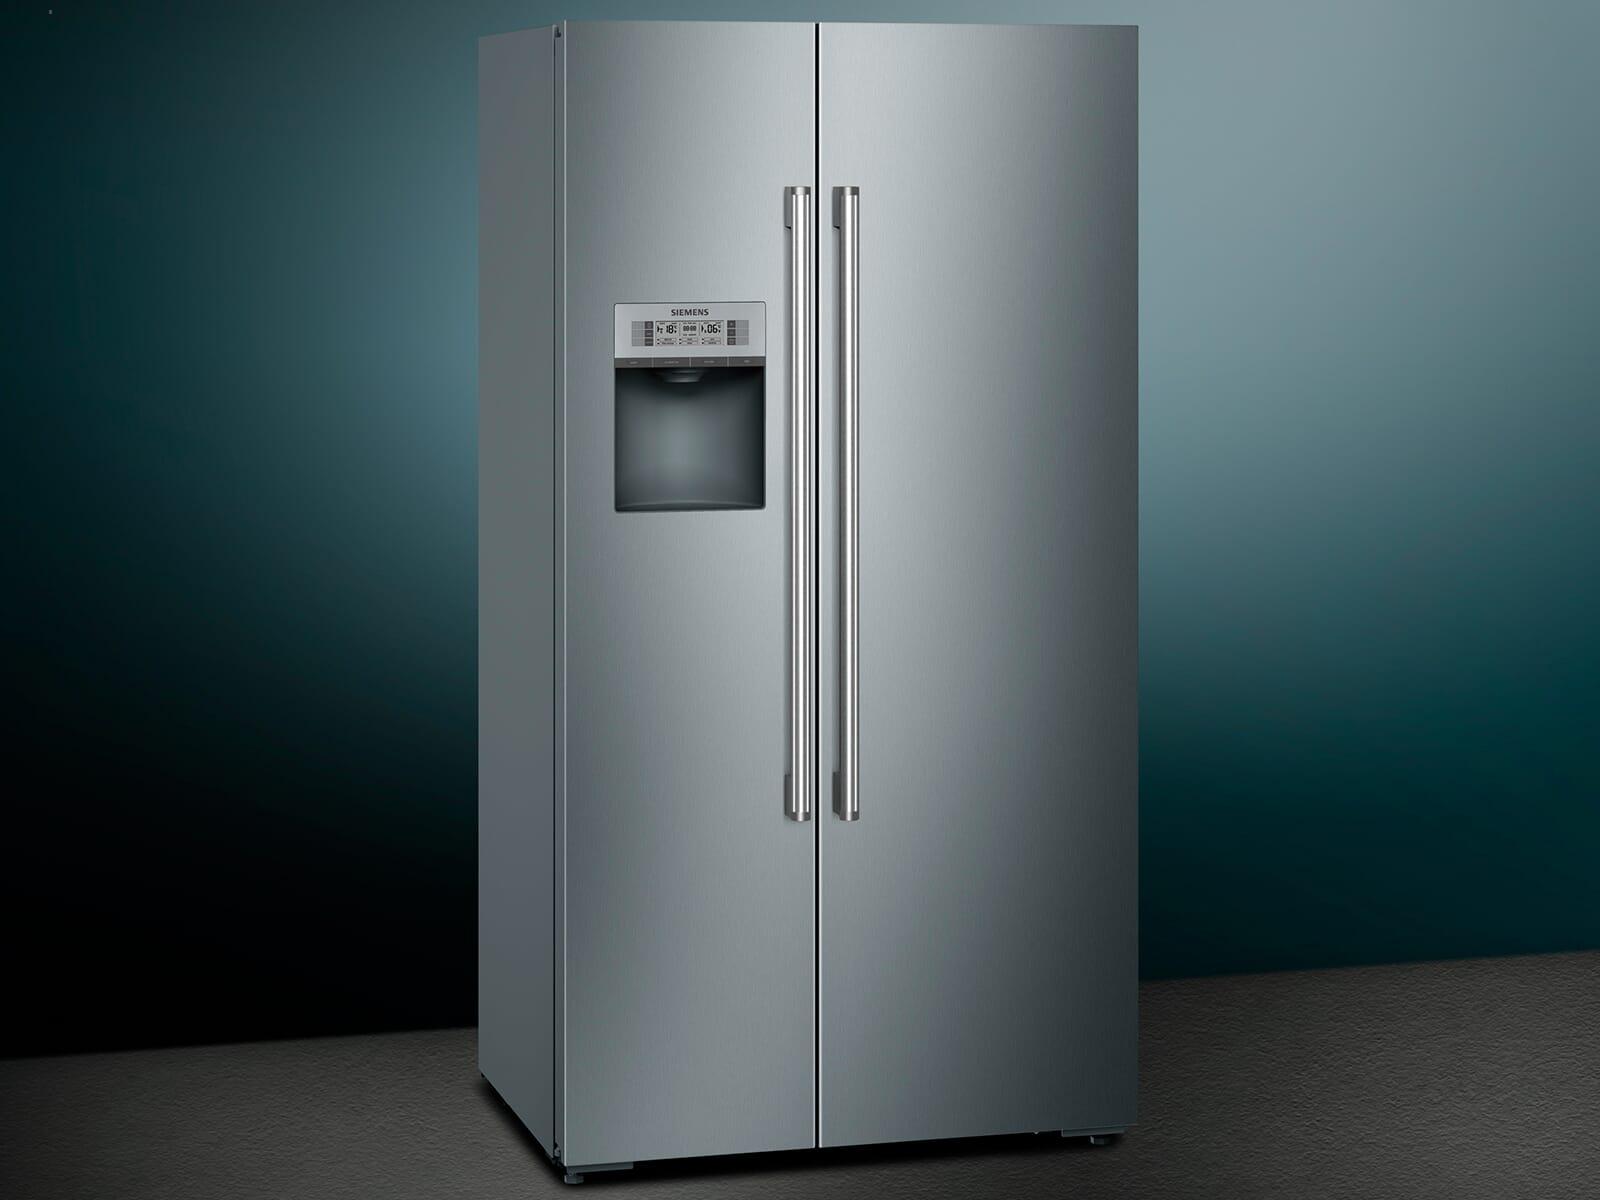 Siemens Kühlschrank Edelstahl : Siemens ka92dhi31 side by side kühl gefrierkombination edelstahl